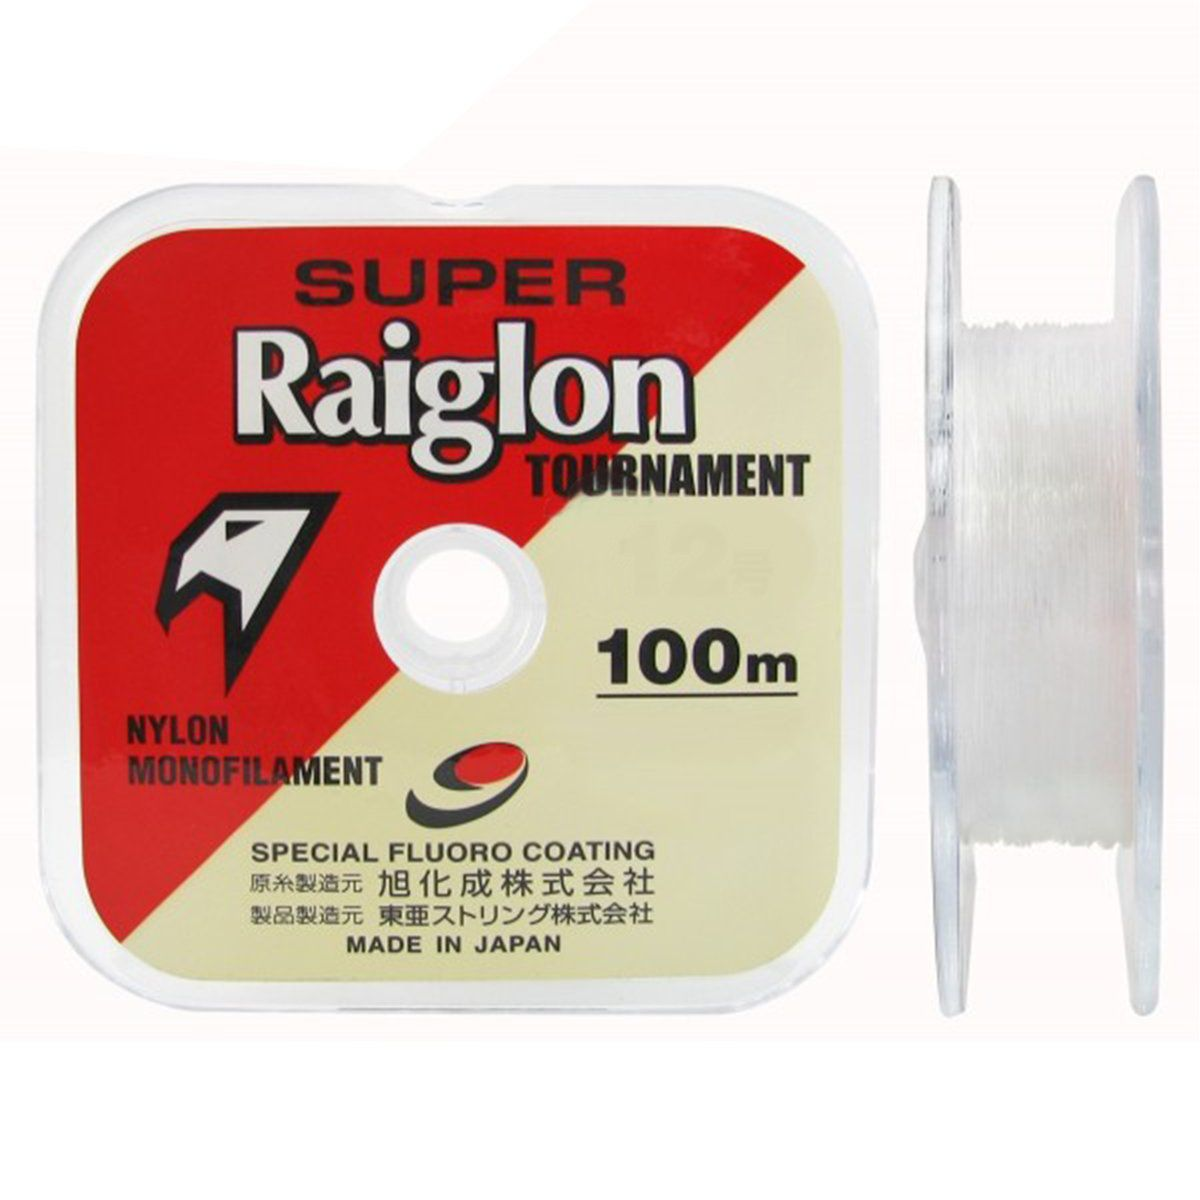 Linha Raiglon Monofilamento Tounament 100m